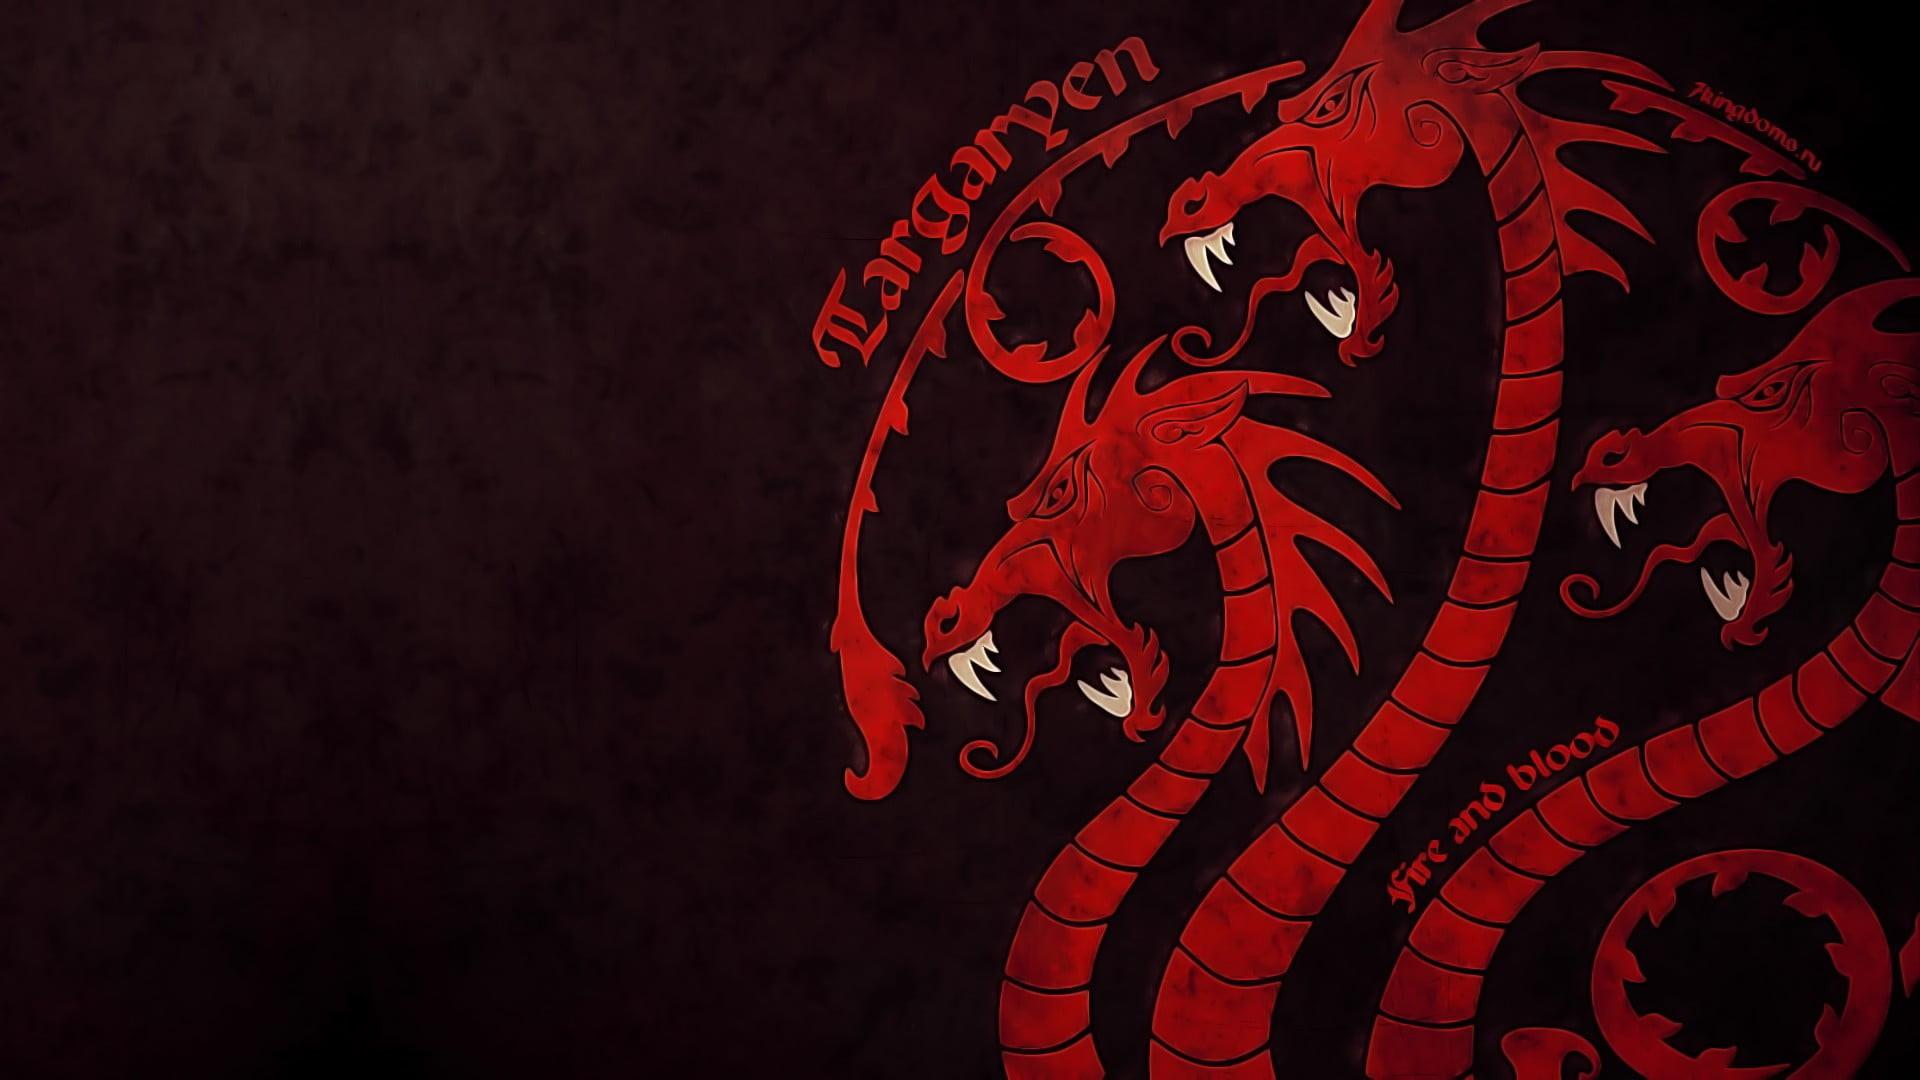 Targaryen Sigil Wallpapers Hd Wallpaper Collections